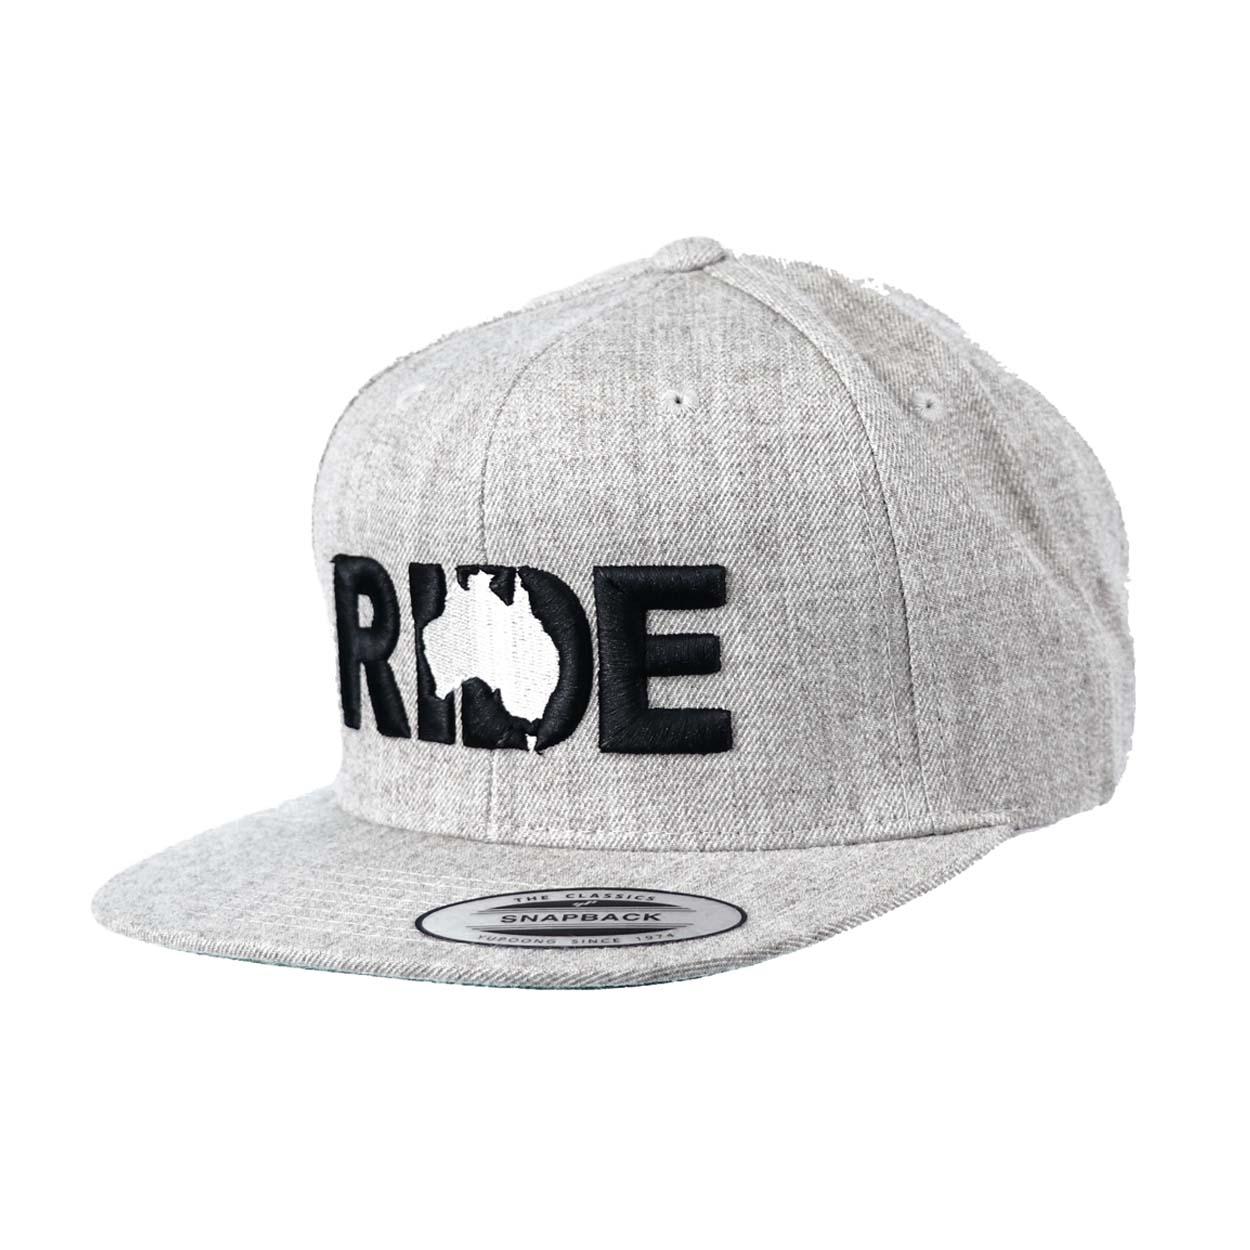 Ride Australia Classic Embroidered  Snapback Flat Brim Hat Gray/Black